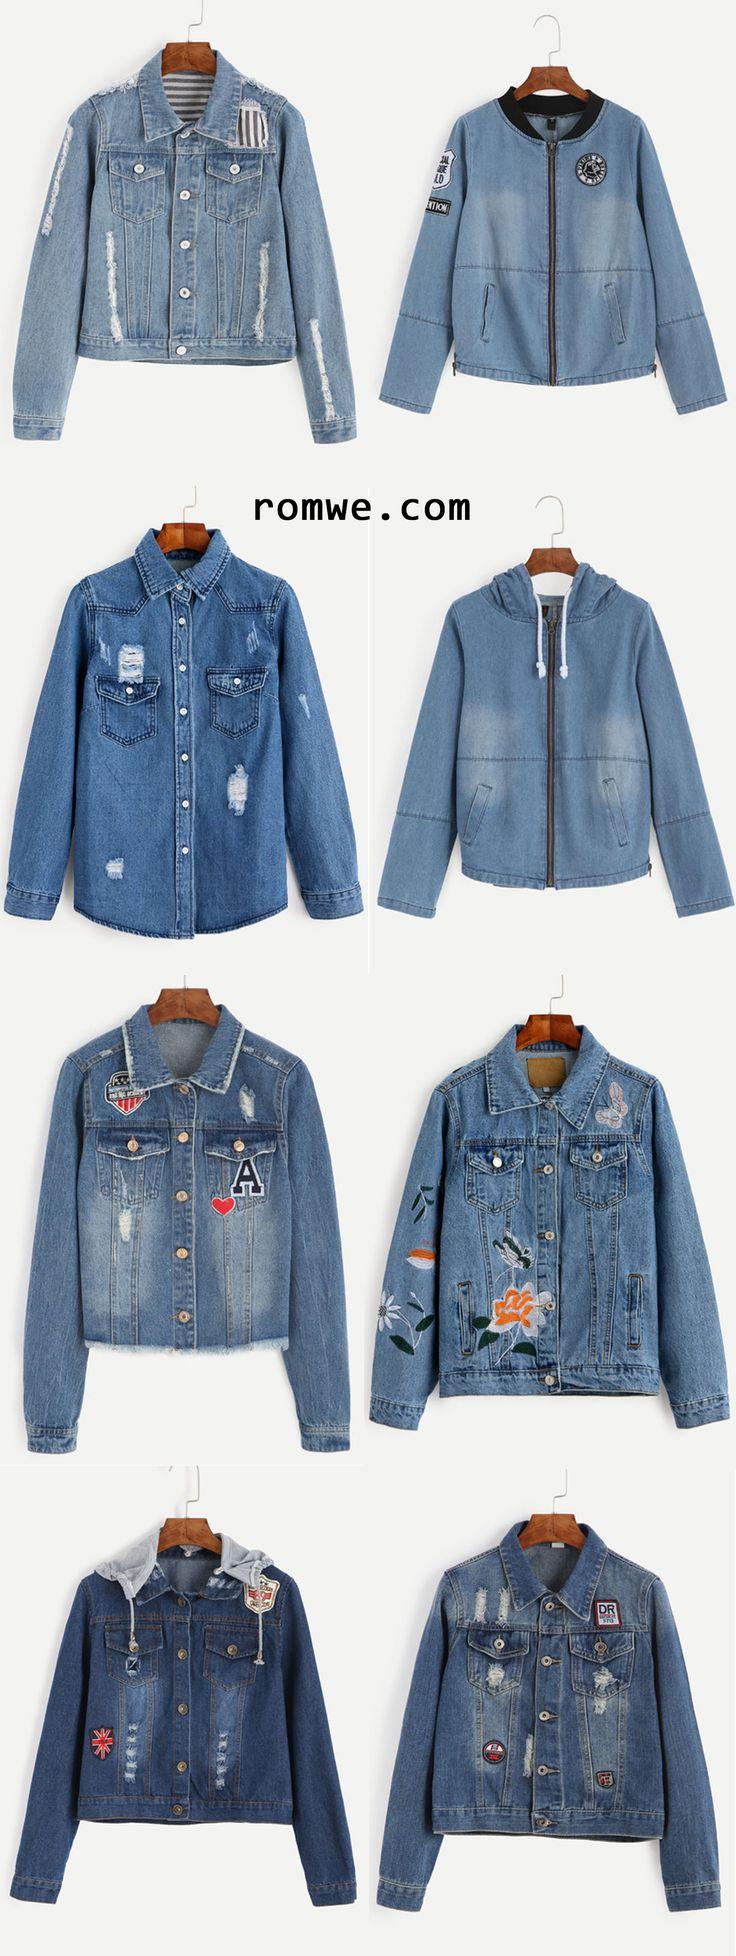 Denim Jackets - street fashion- romwe.com